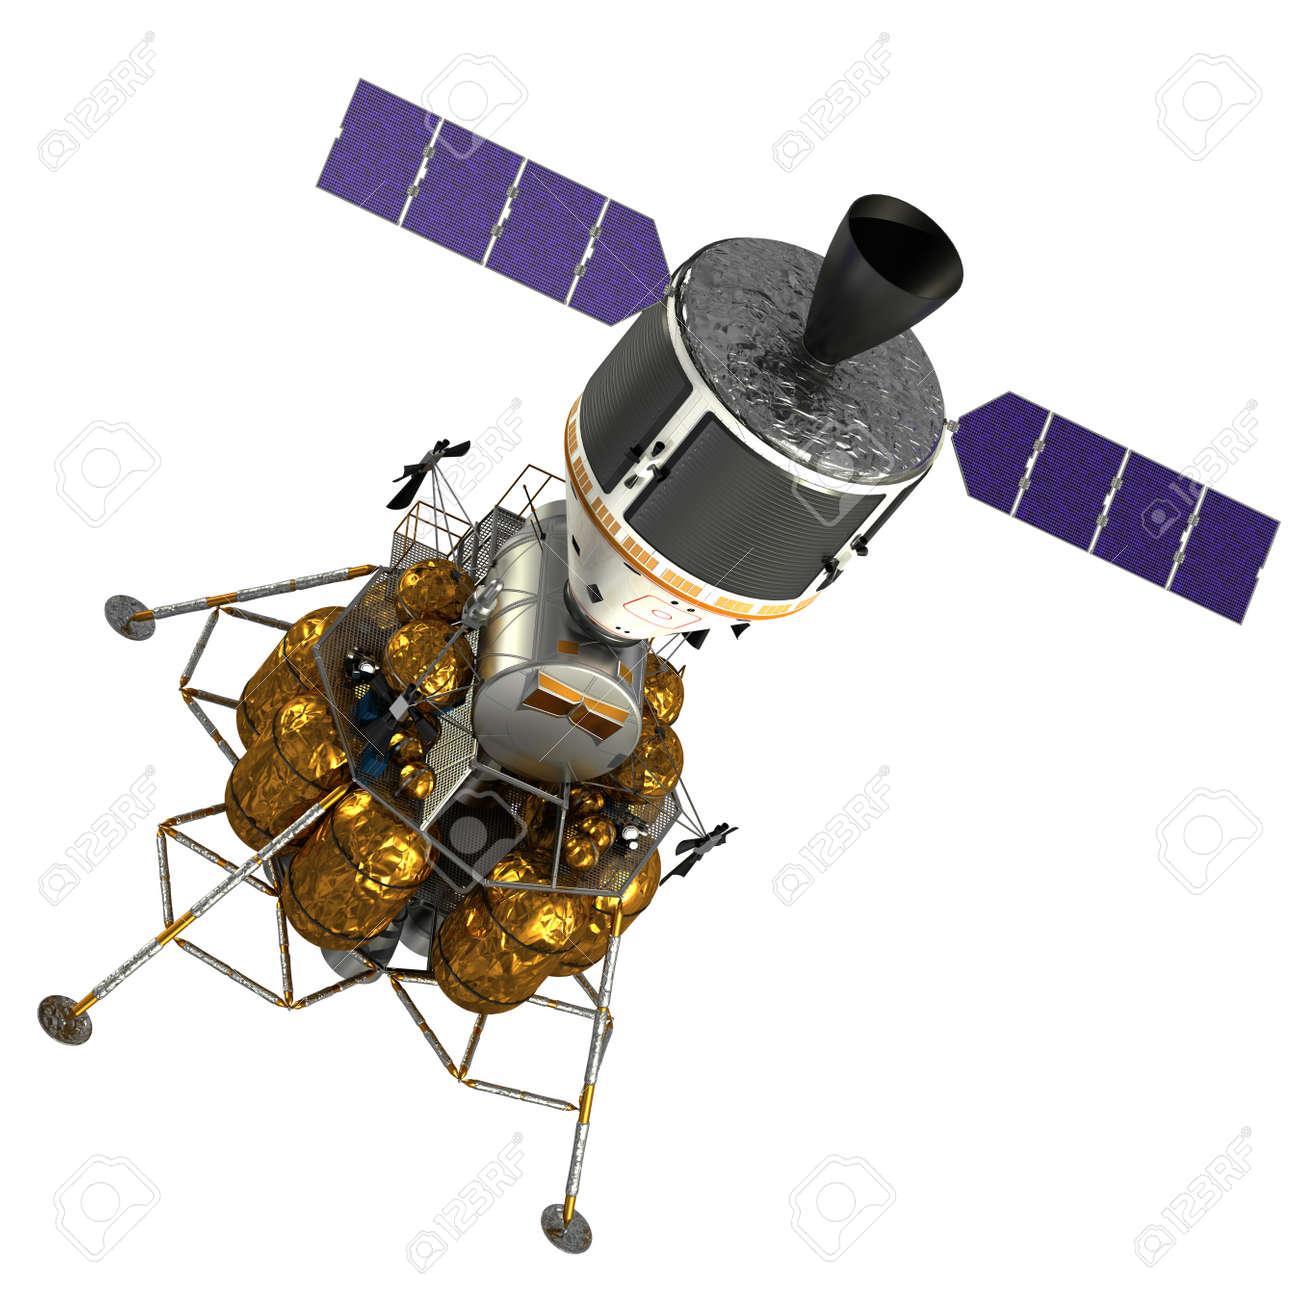 Crew Exploration Vehicle On White Background. 3D Model. - 36672775